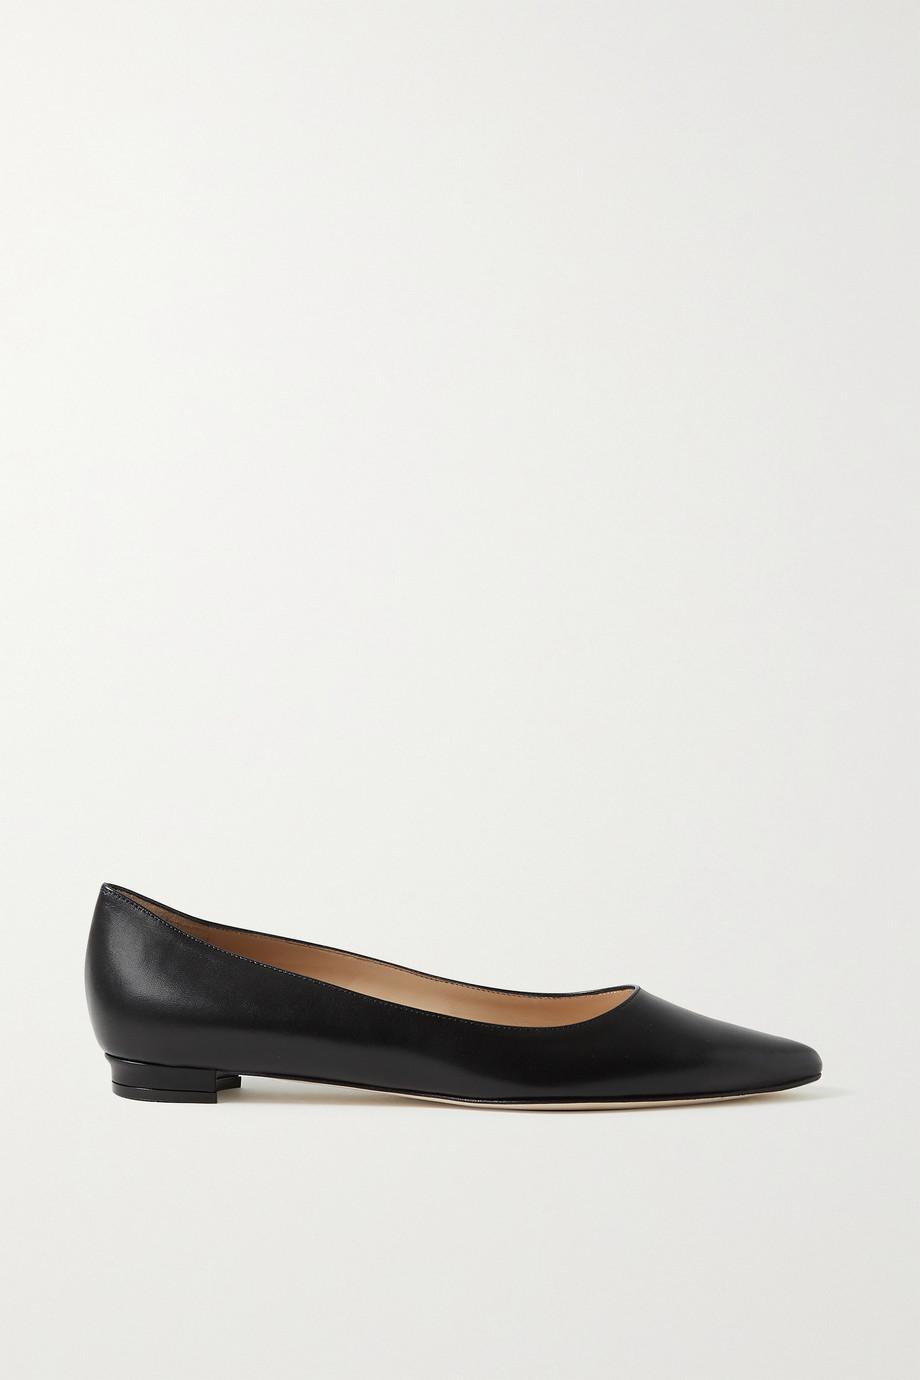 Manolo Blahnik Titto leather point-toe flats